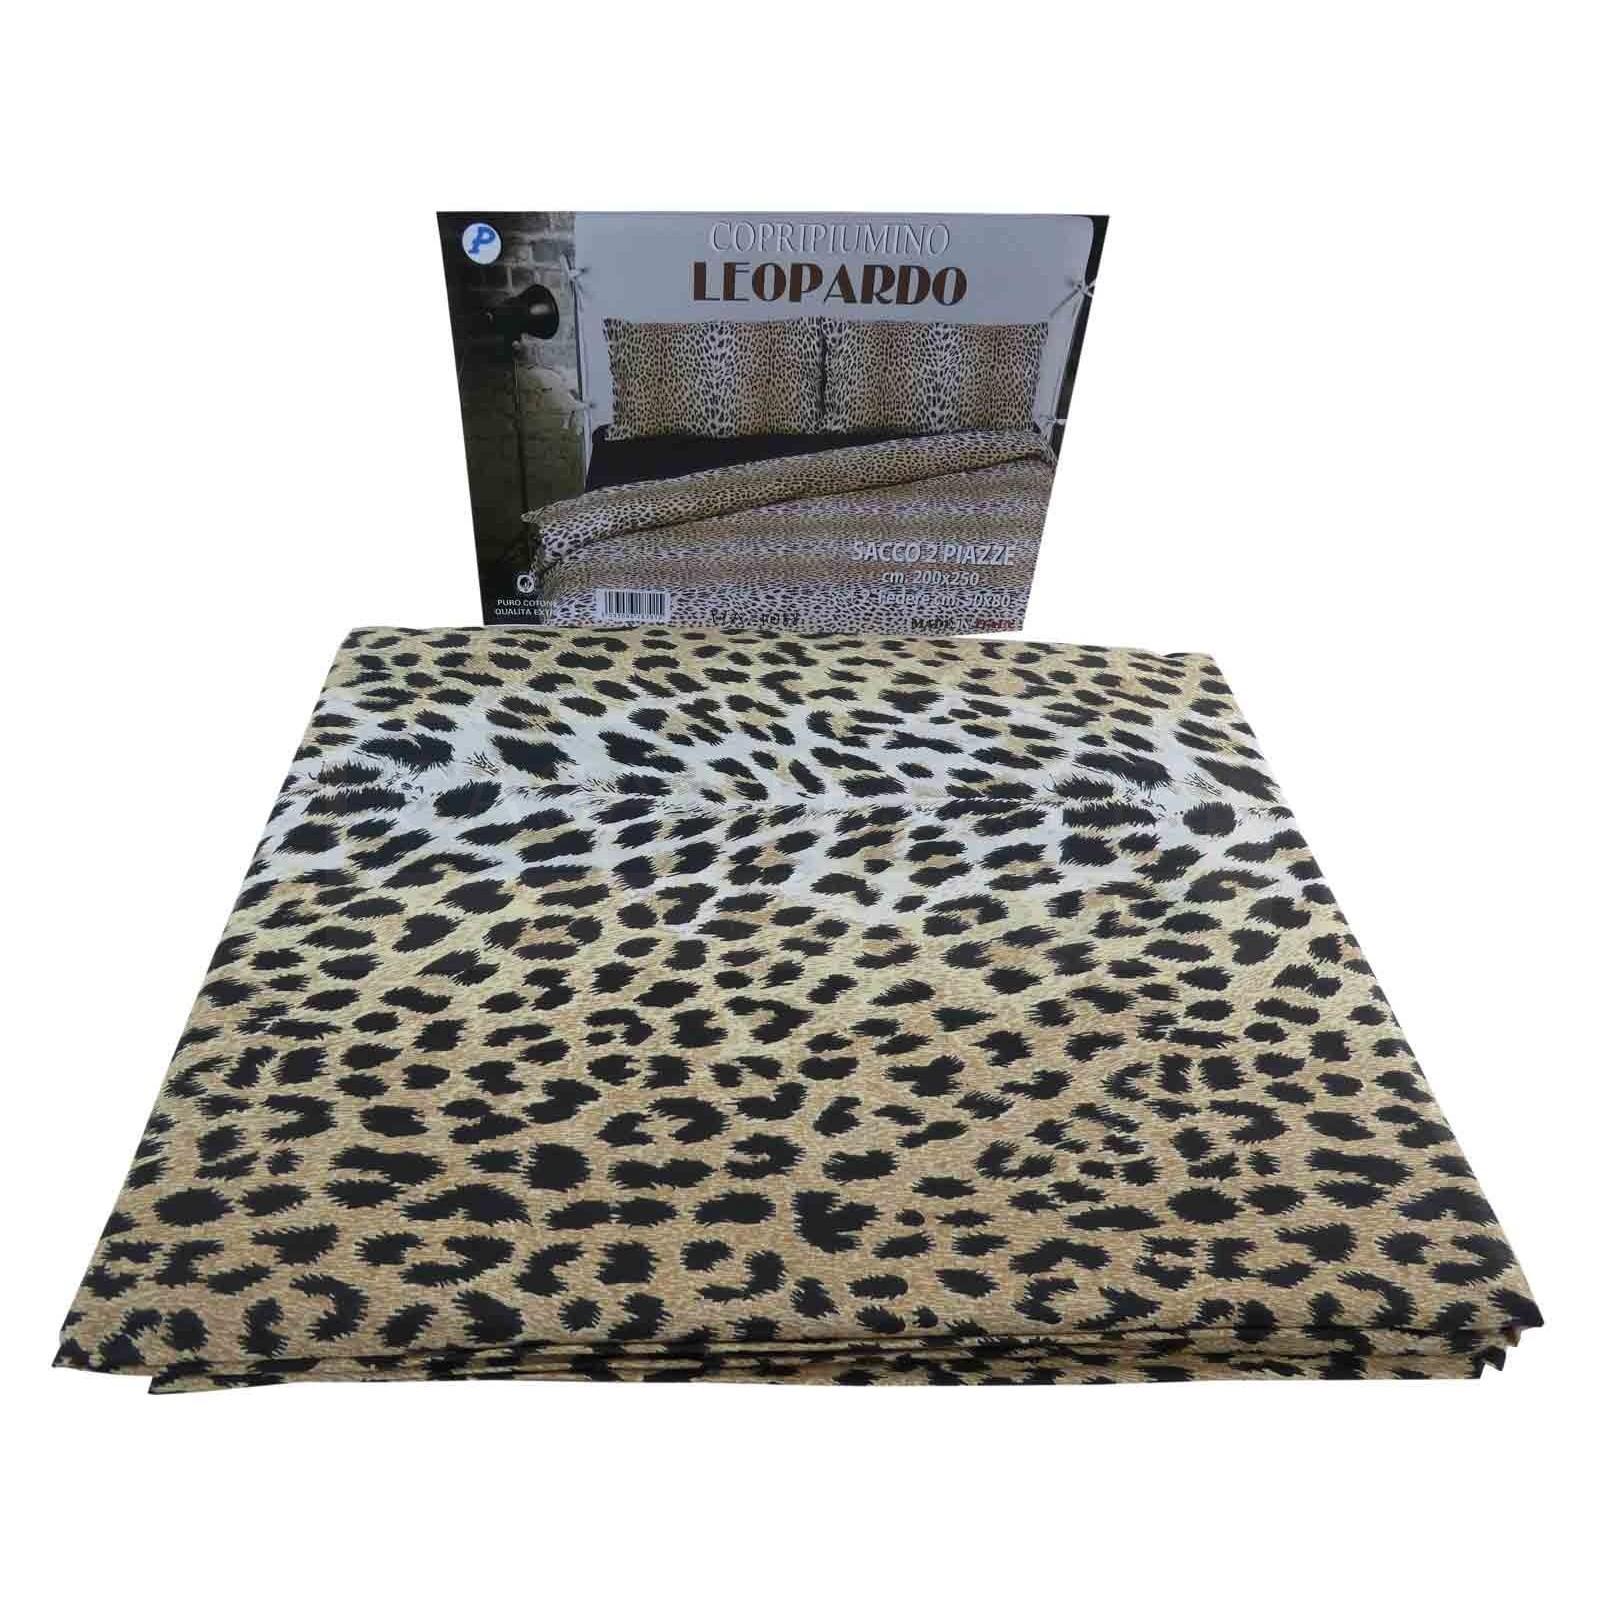 Copripiumino 200 X 250.Cotton Bag Duvet Cover With Pillow Cases Leopardo Casa Tessile